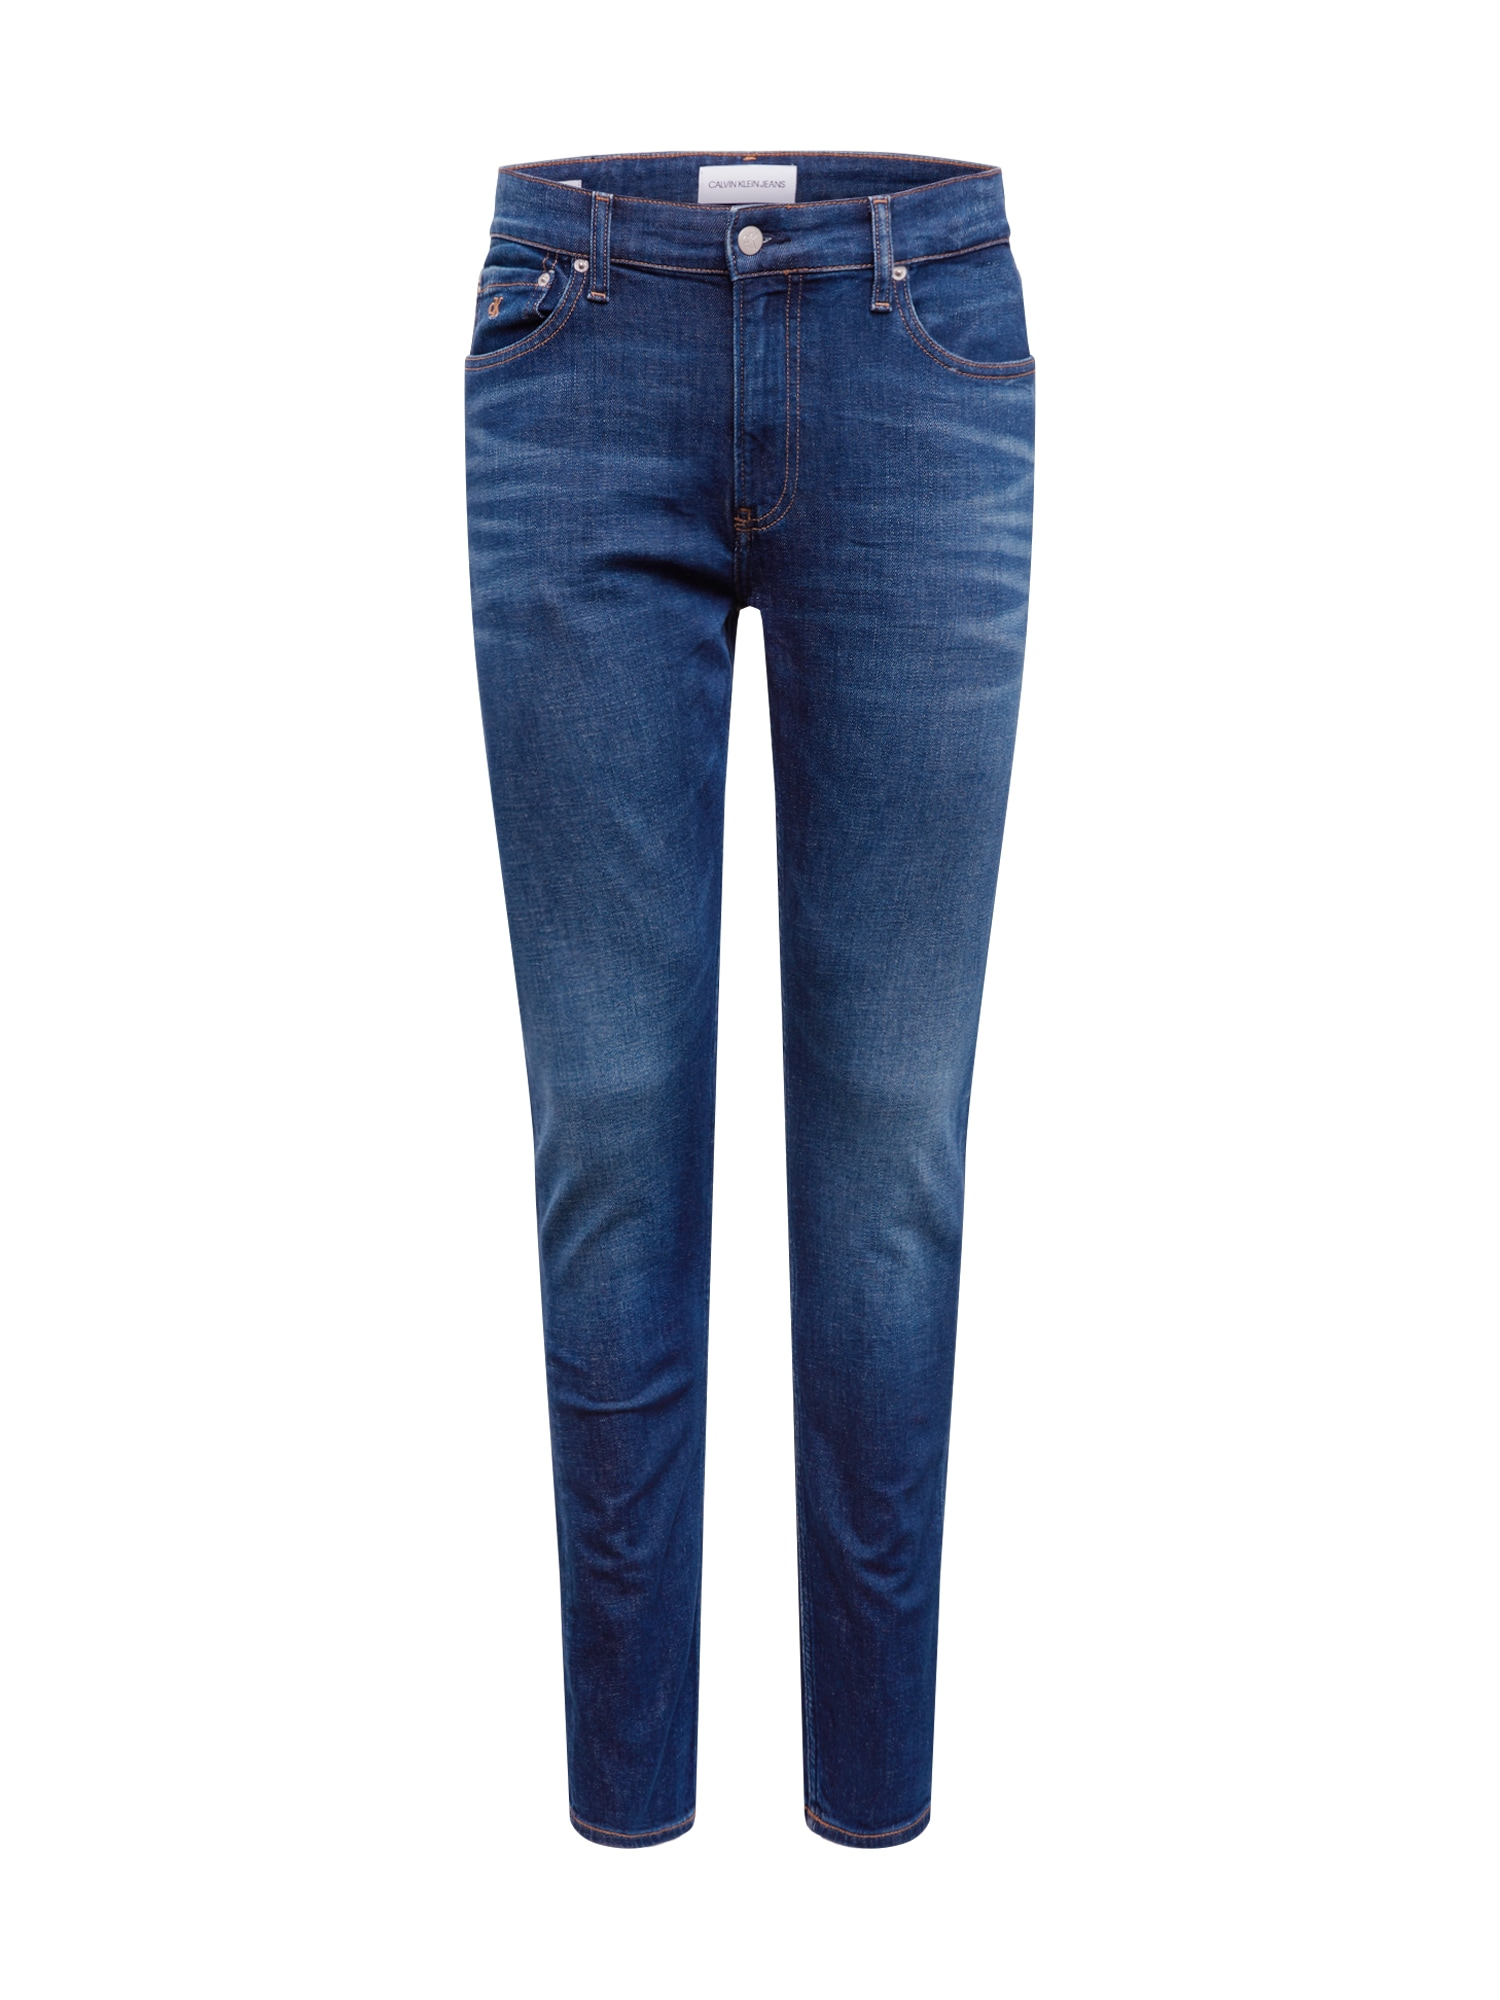 Calvin Klein Jeans Džinsai '026 SLIM' tamsiai (džinso) mėlyna